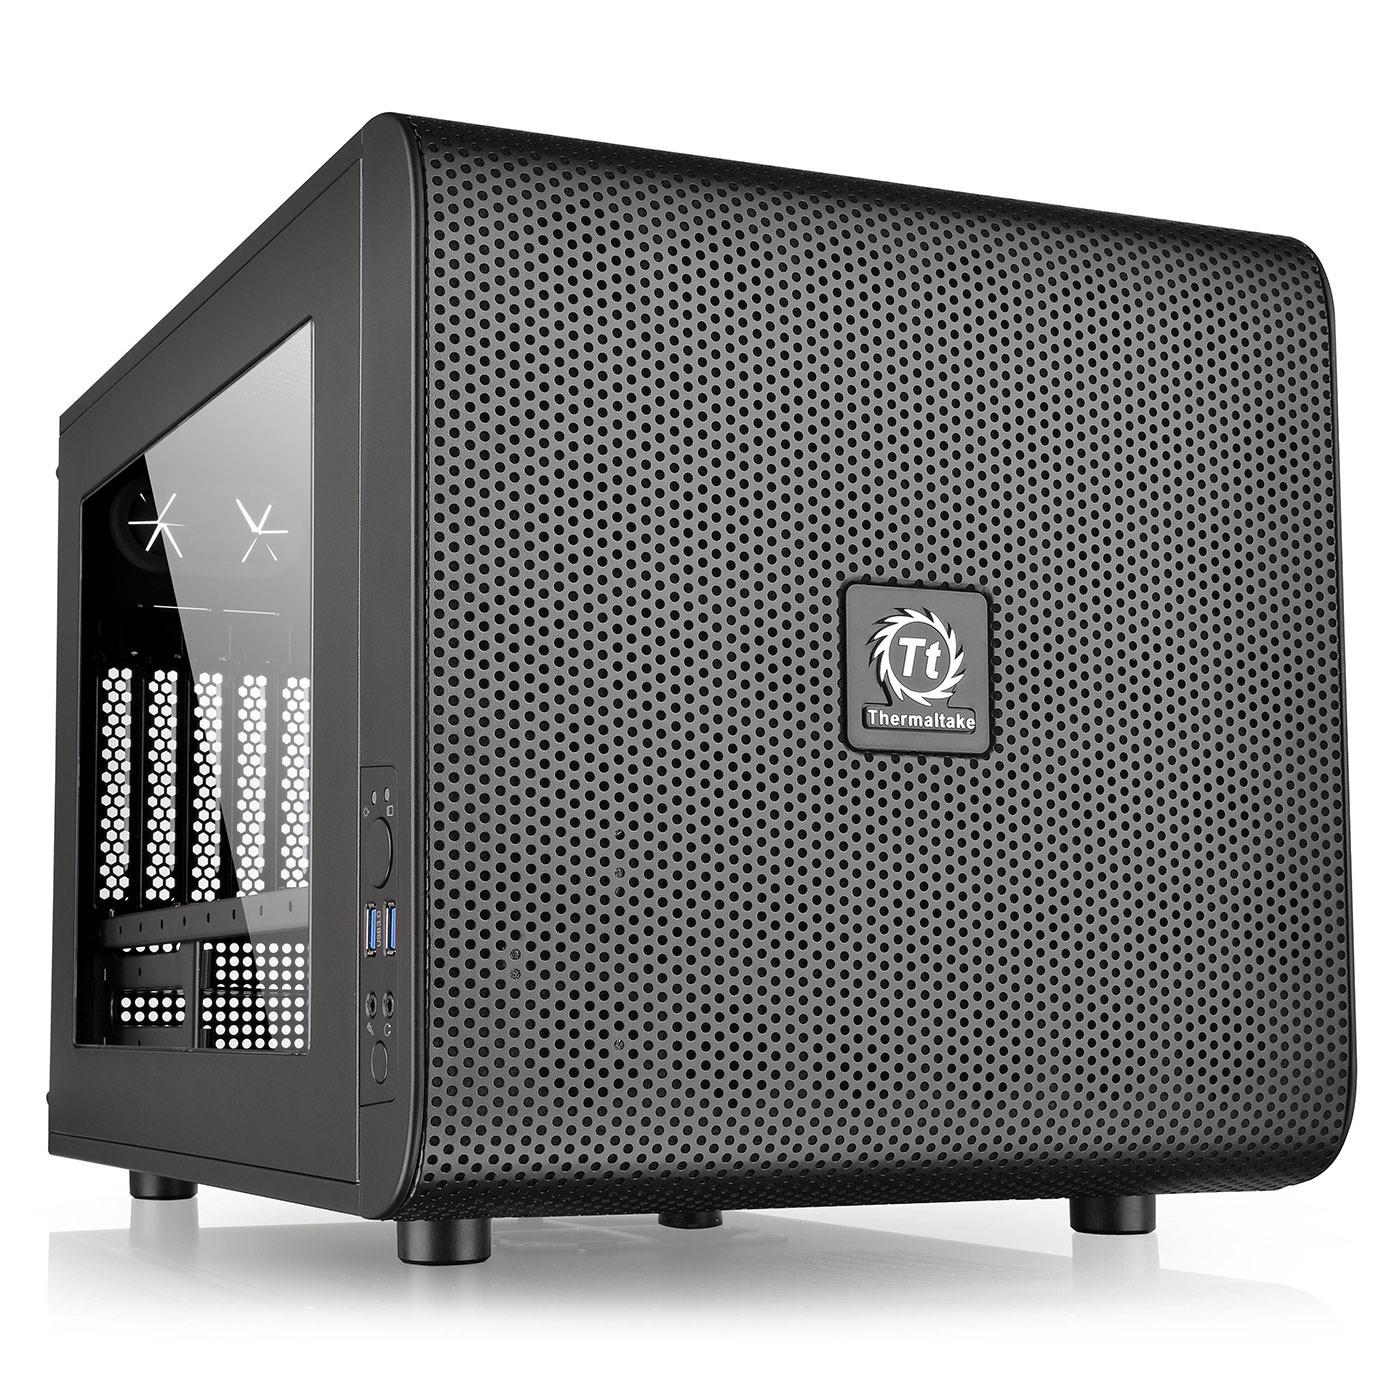 Boîtier empilable pour PC Thermaltake Core V21 - Micro-ATX